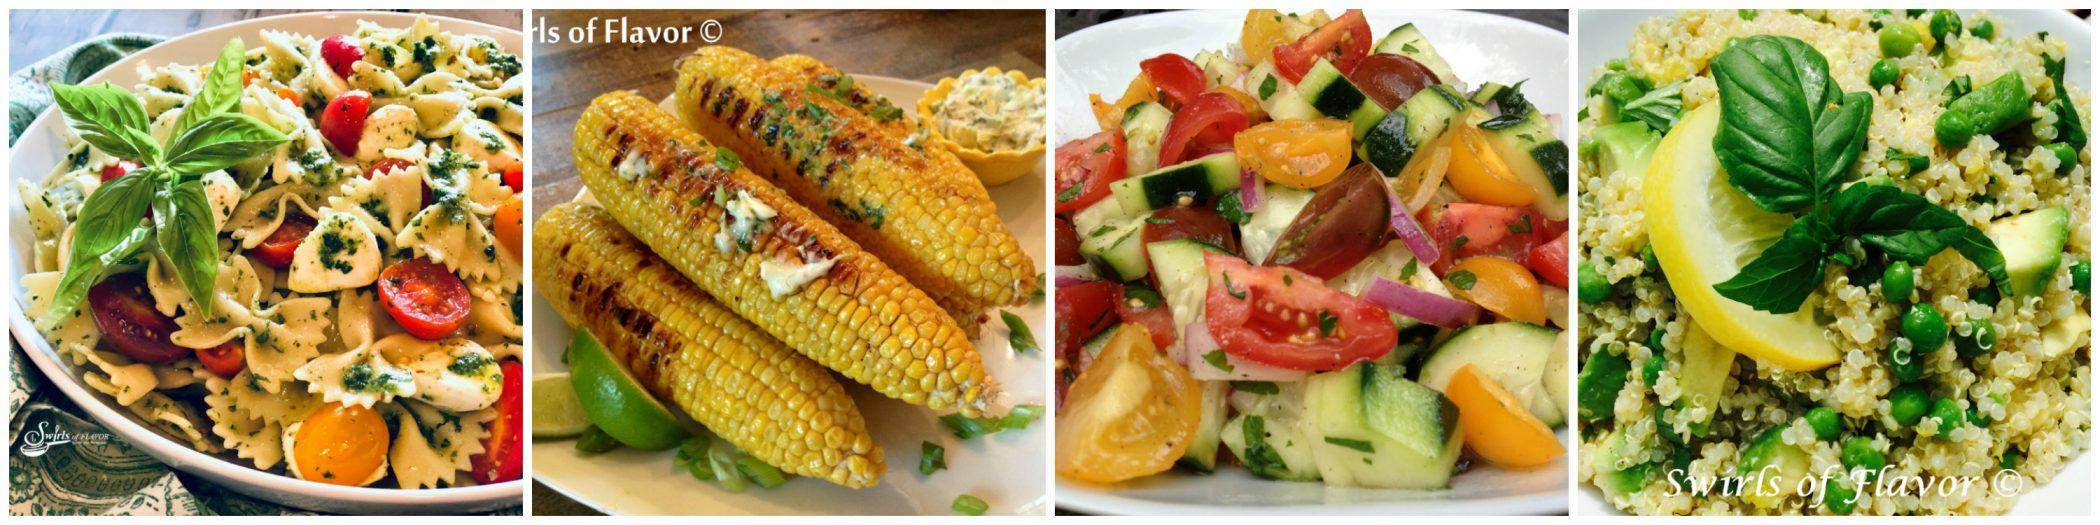 Left to Right: Pasta Salad; Grilled Corn; Cucumber Salad; Quinoa Salad